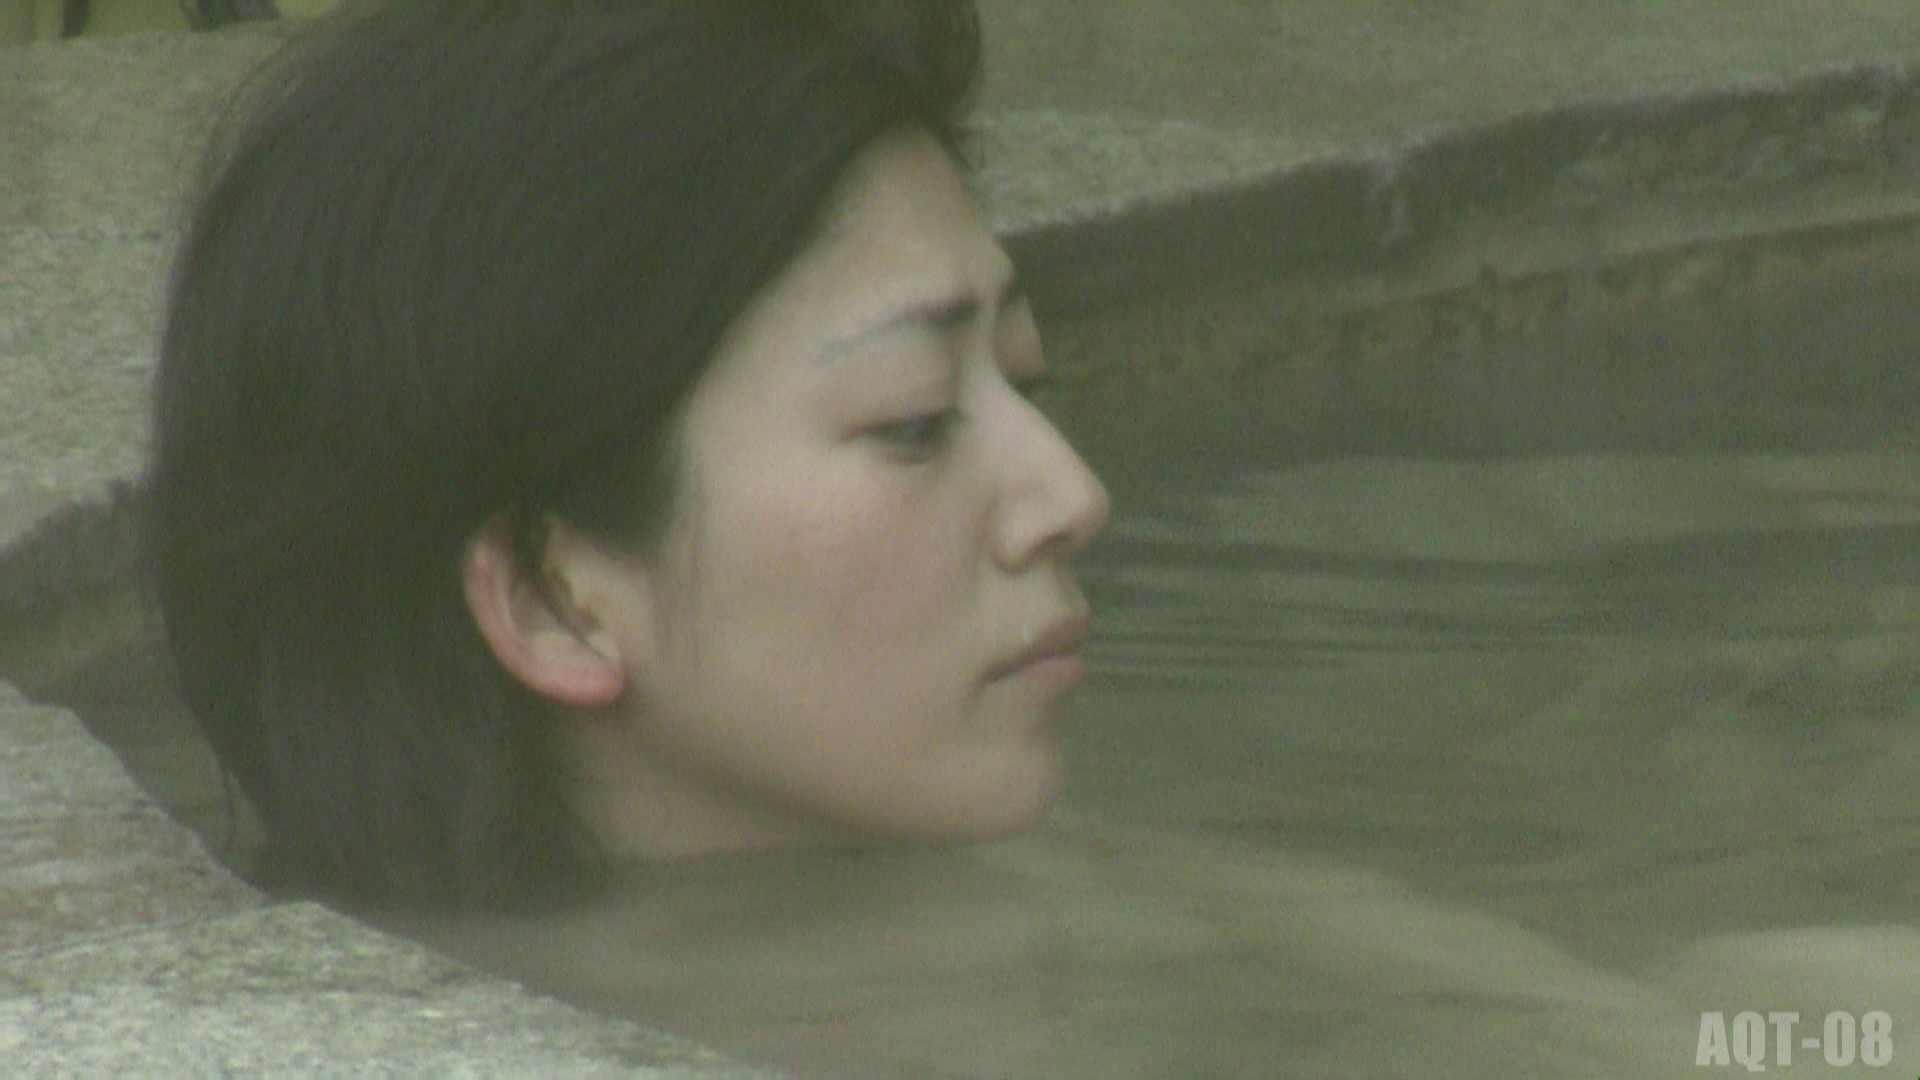 Aquaな露天風呂Vol.776 盗撮 エロ無料画像 108画像 44